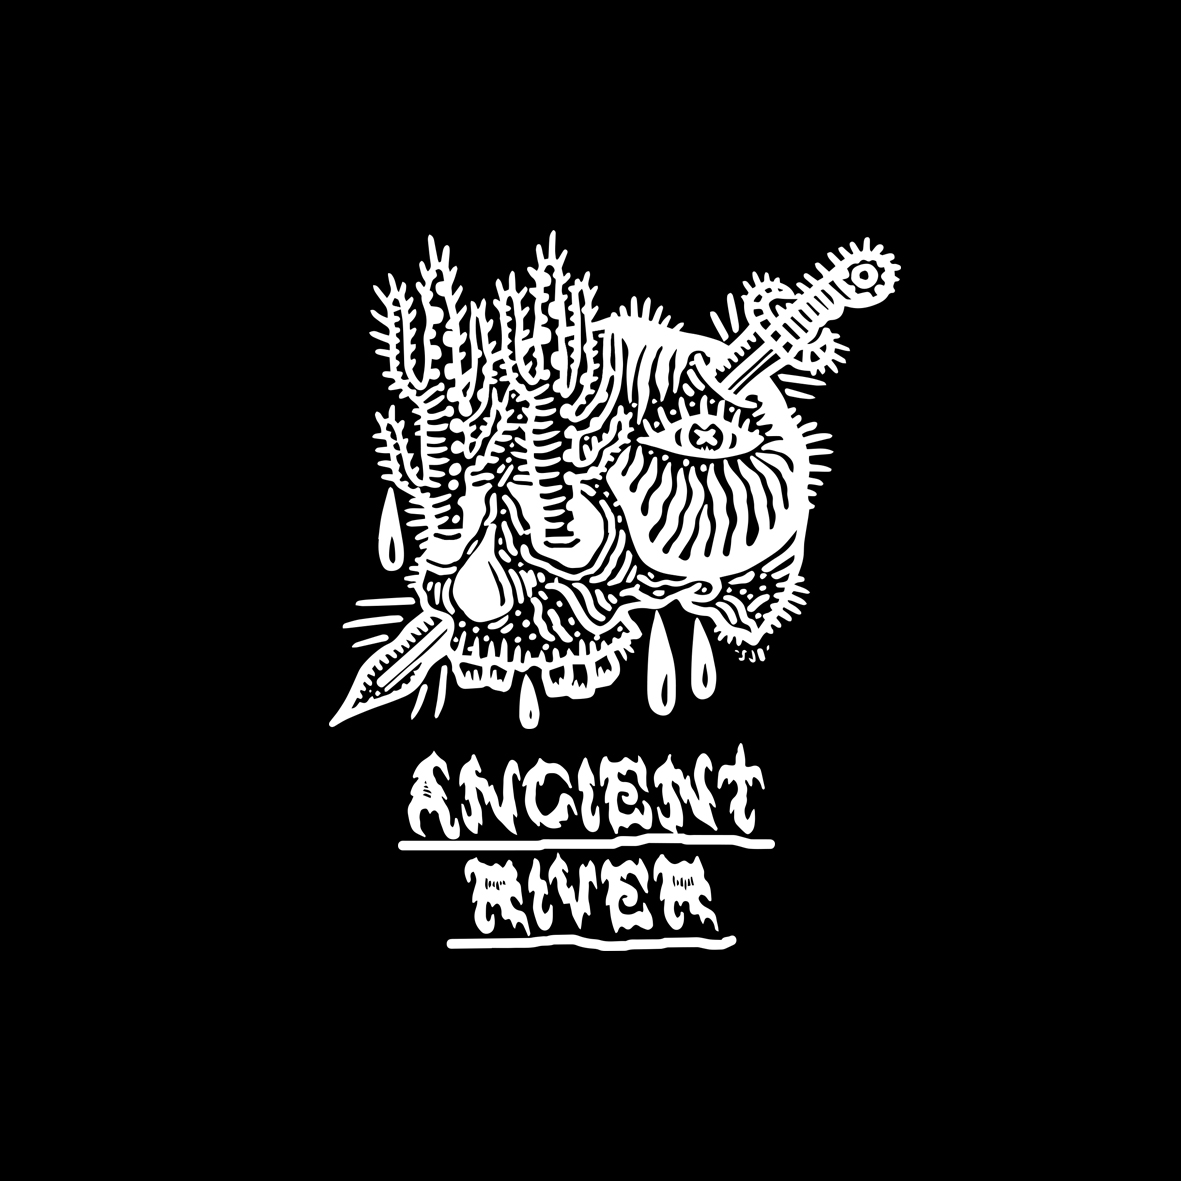 Sean Ancient River Tee SUMMER MOON STUDIO black.jpg